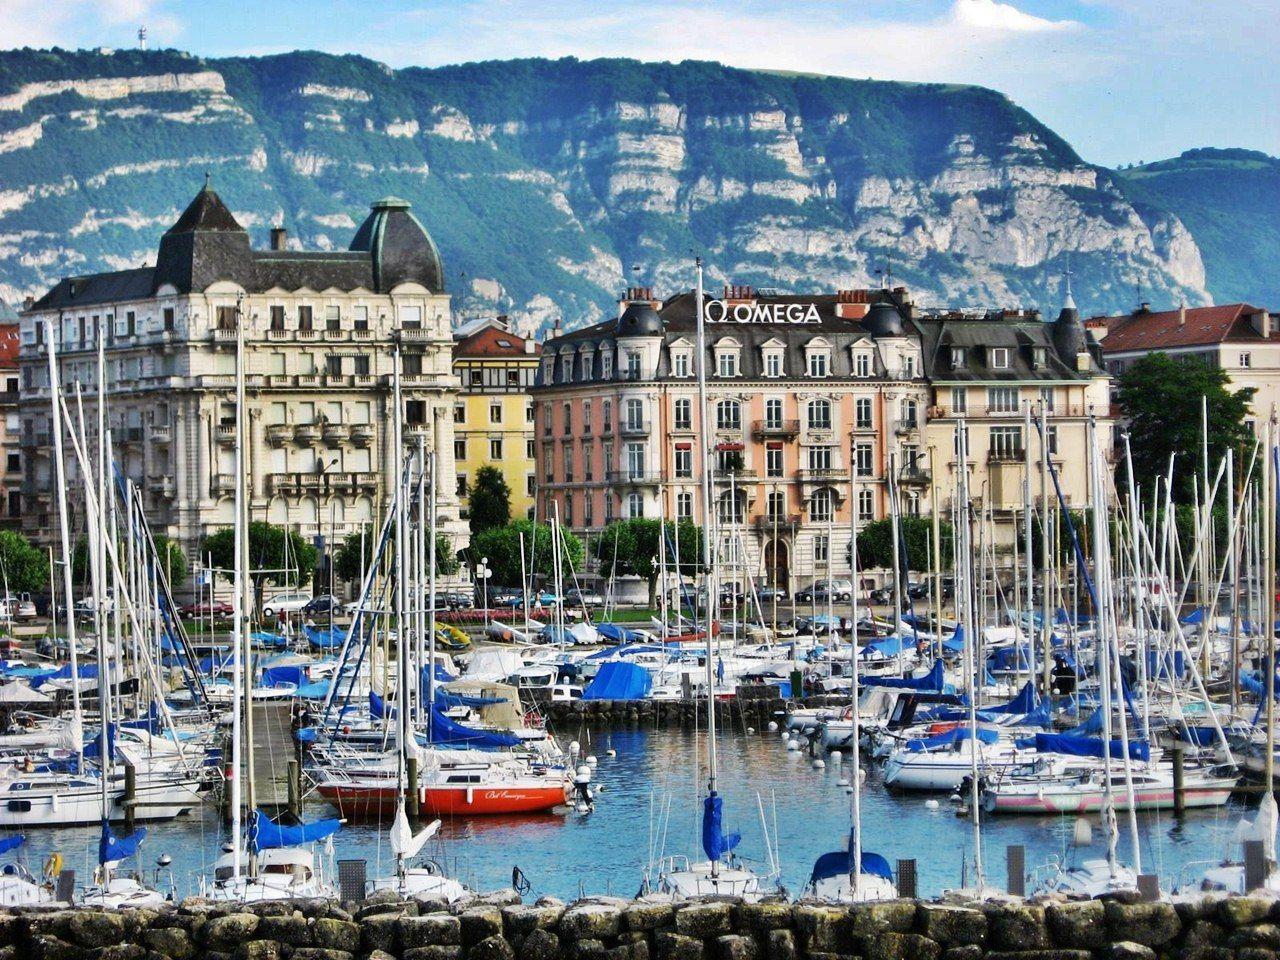 Geneva | geneva Geneva, Switzerland | Places to travel